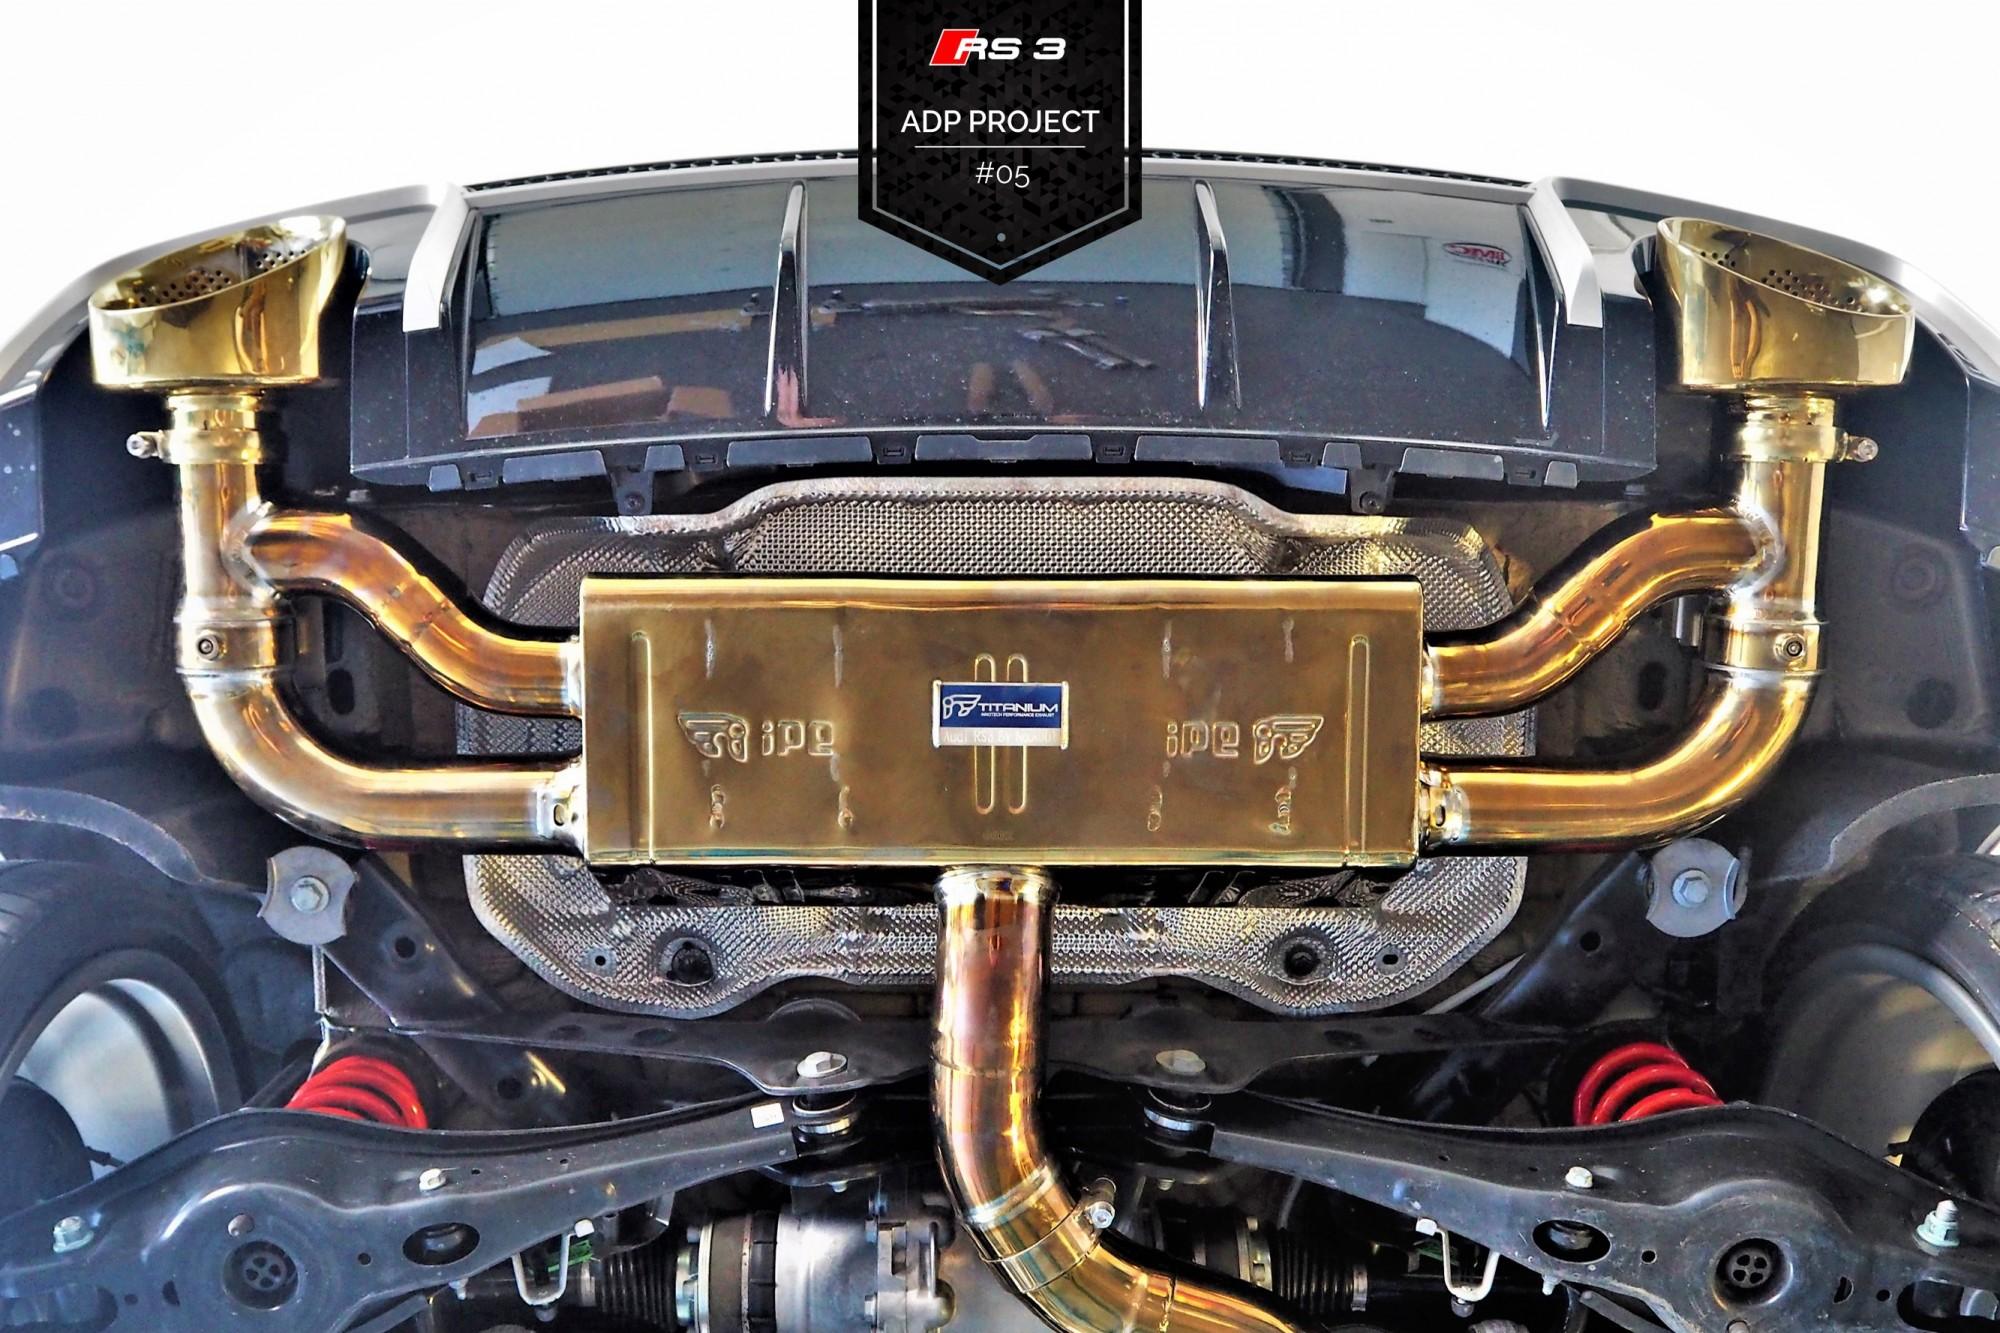 Echappement iPE Innotech Titane Cannes - Audi RS3 8V ADP Performance